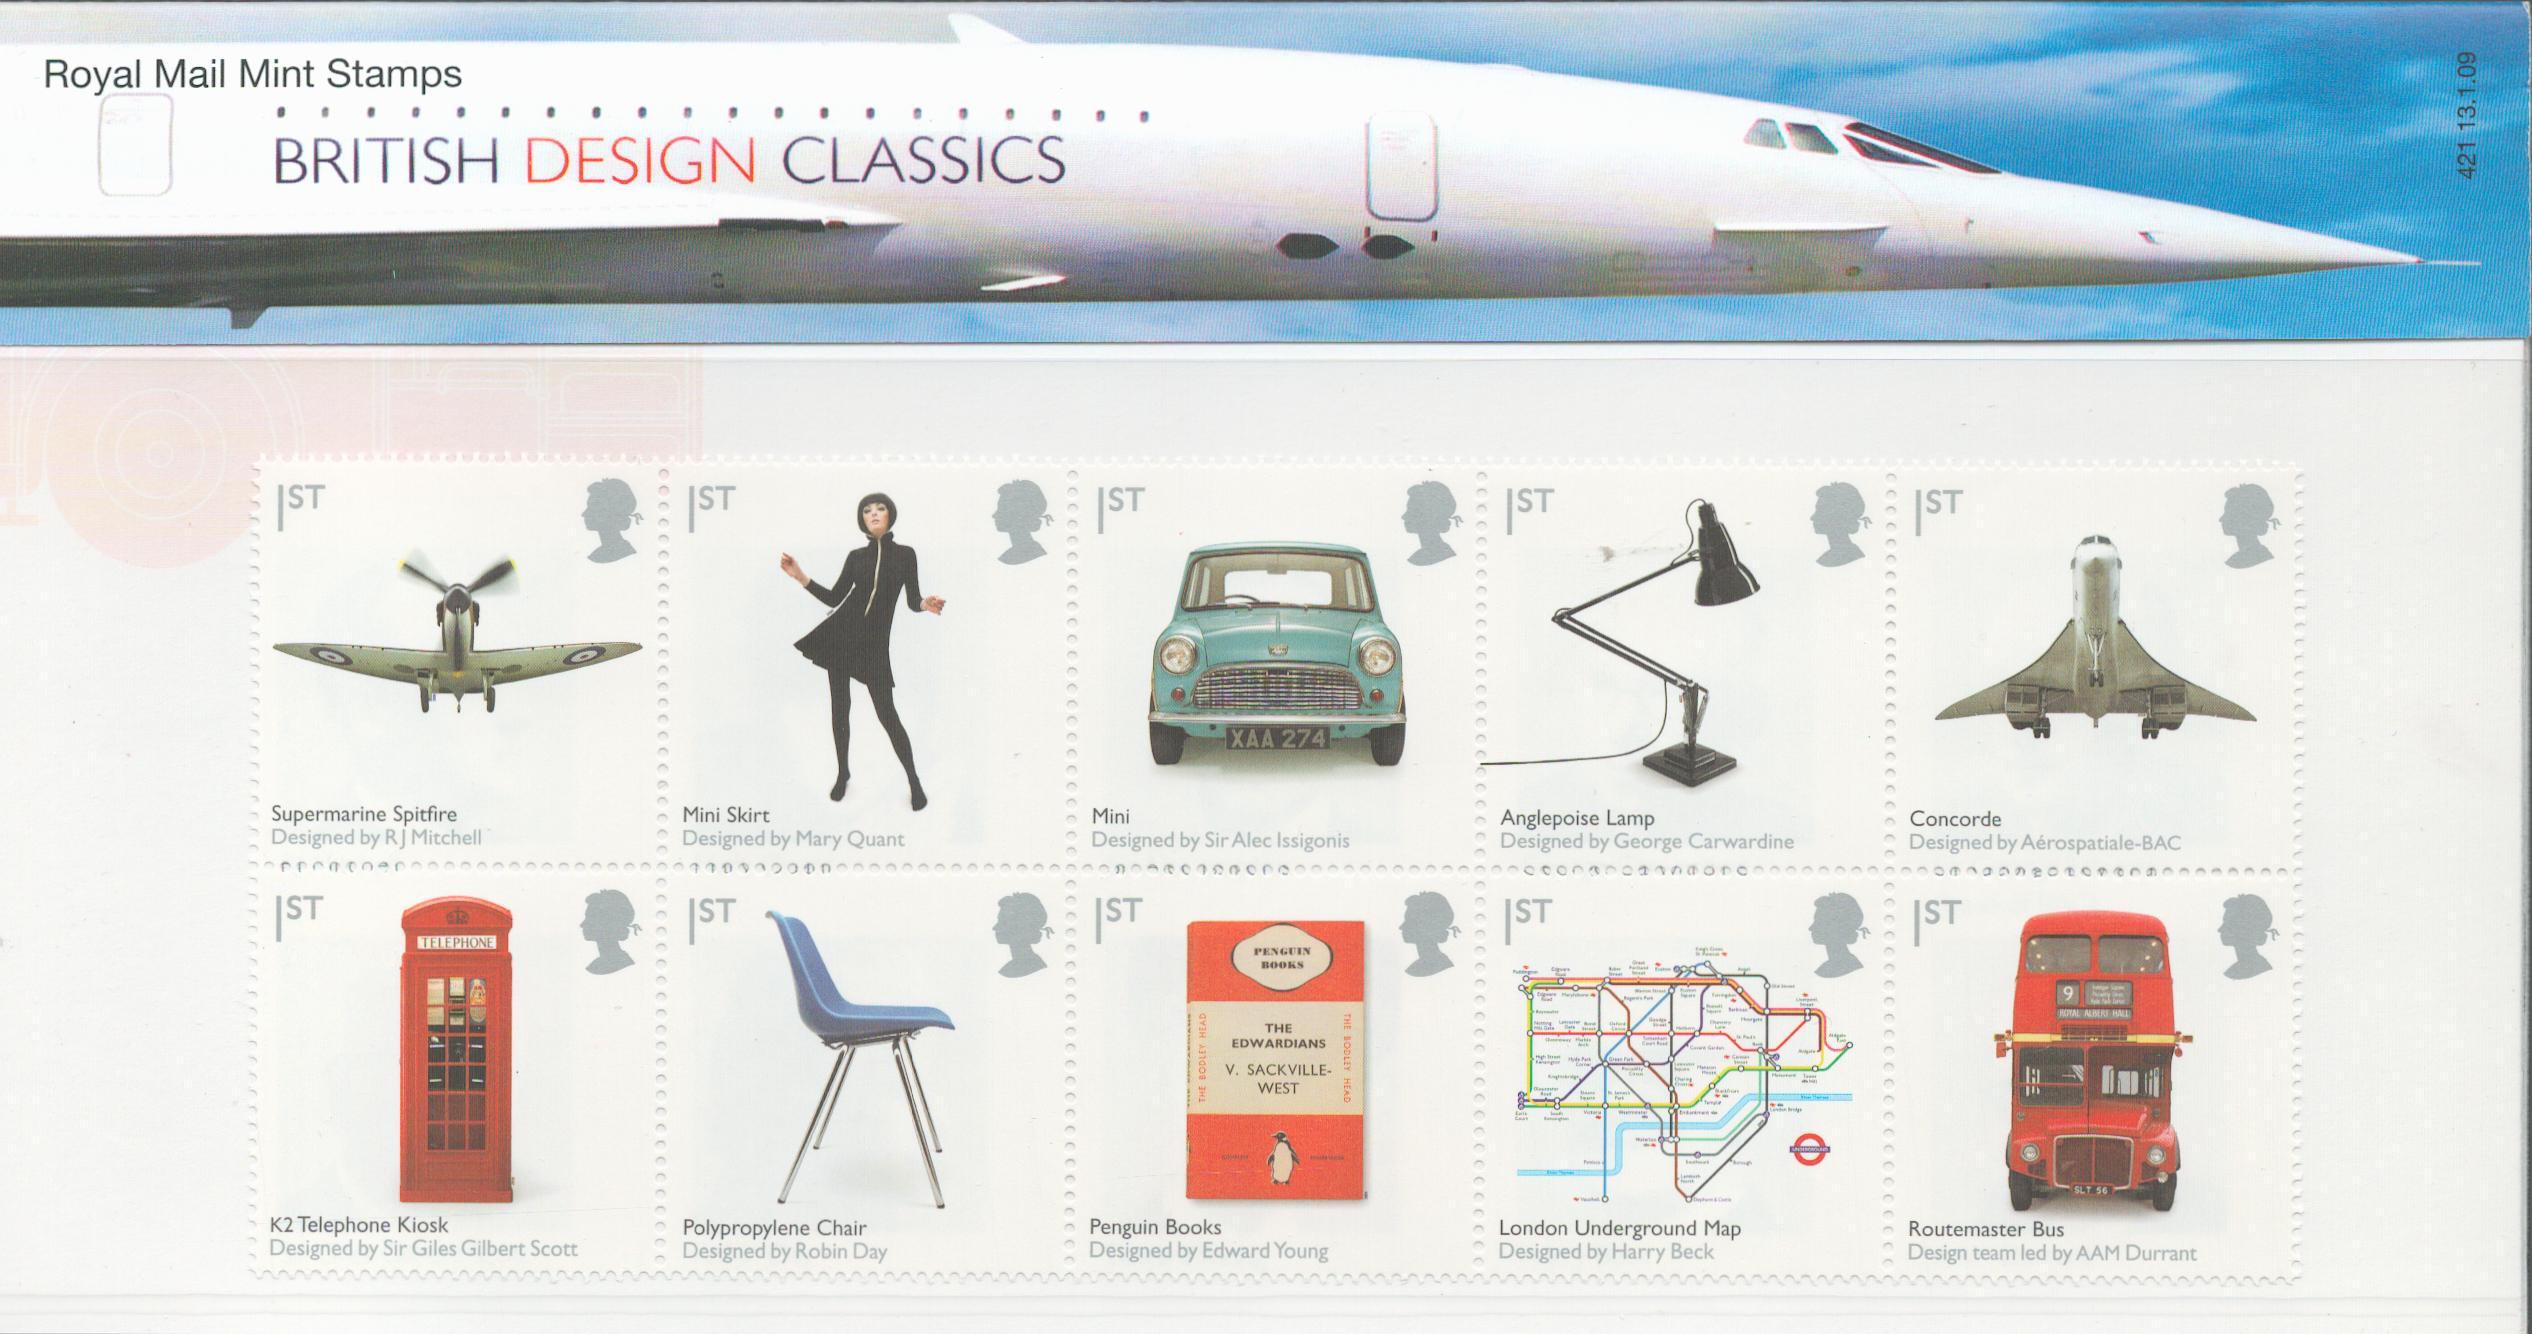 GB presentation pack 13/1/2009 British design classics. 10 1st class stamps. Good condition. We